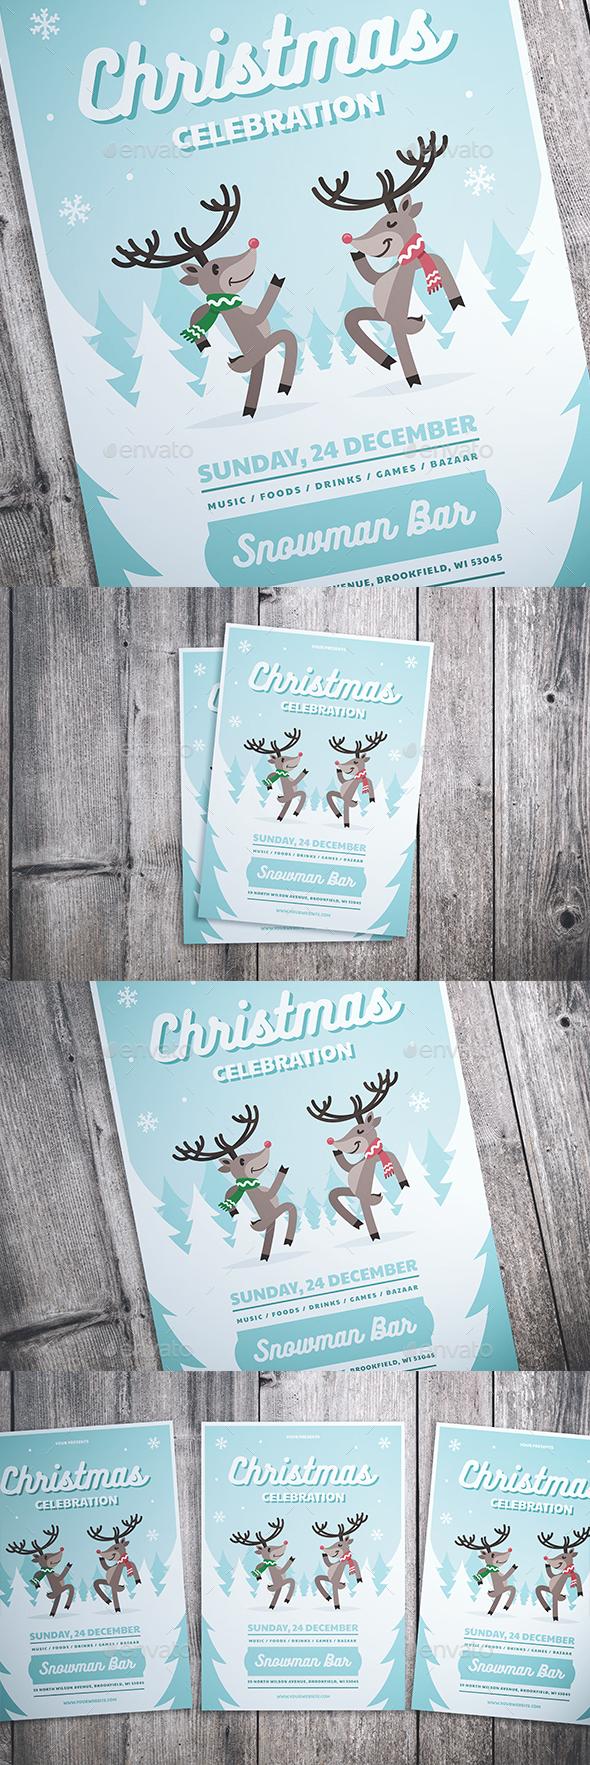 GraphicRiver Christmas Celebration Flyer 21061479